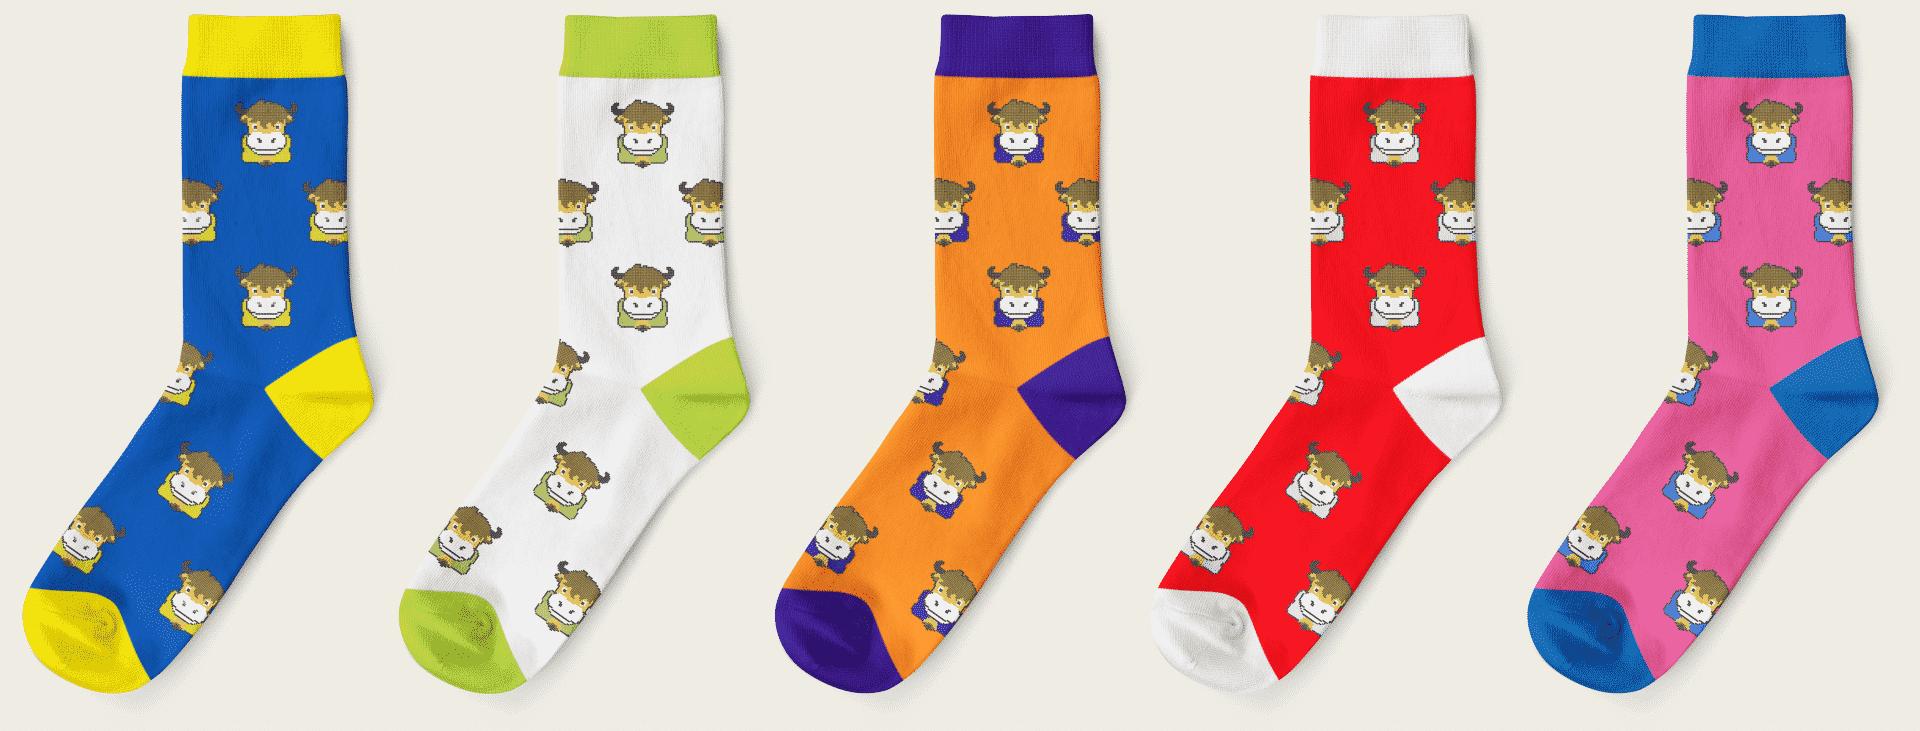 Lunar Lucky Socks